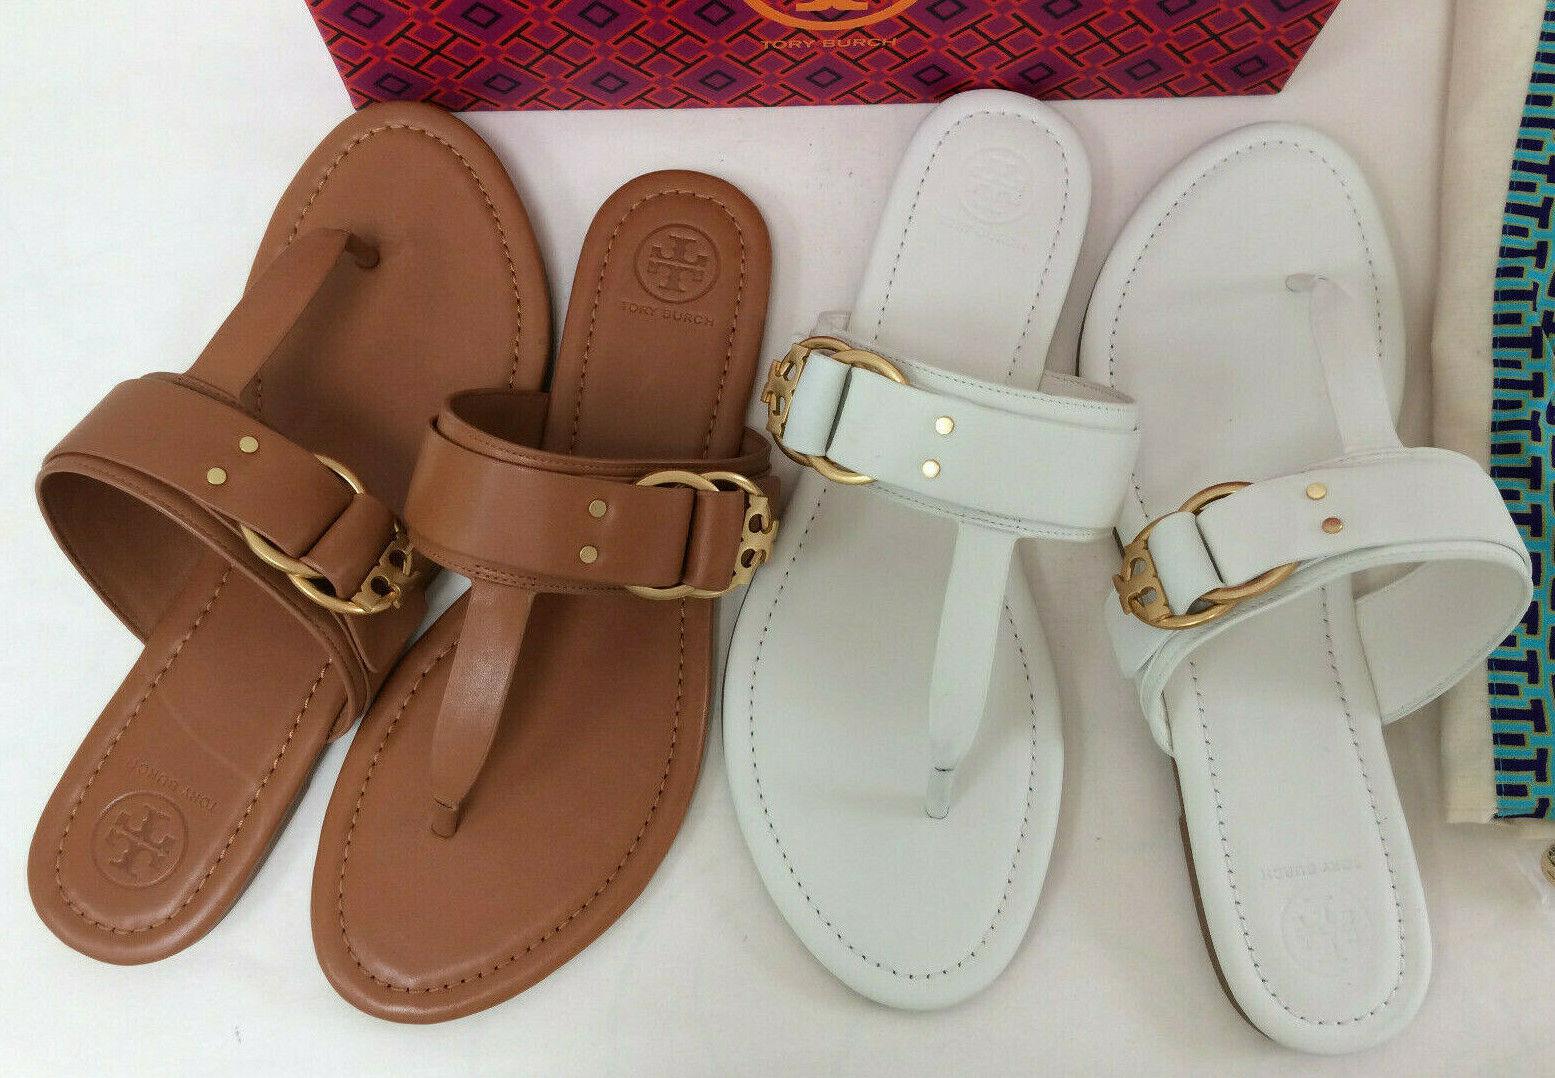 New Tory Burch Marsden Leather Flat Thong Sandal Flip Flop Brown 9M White 11M